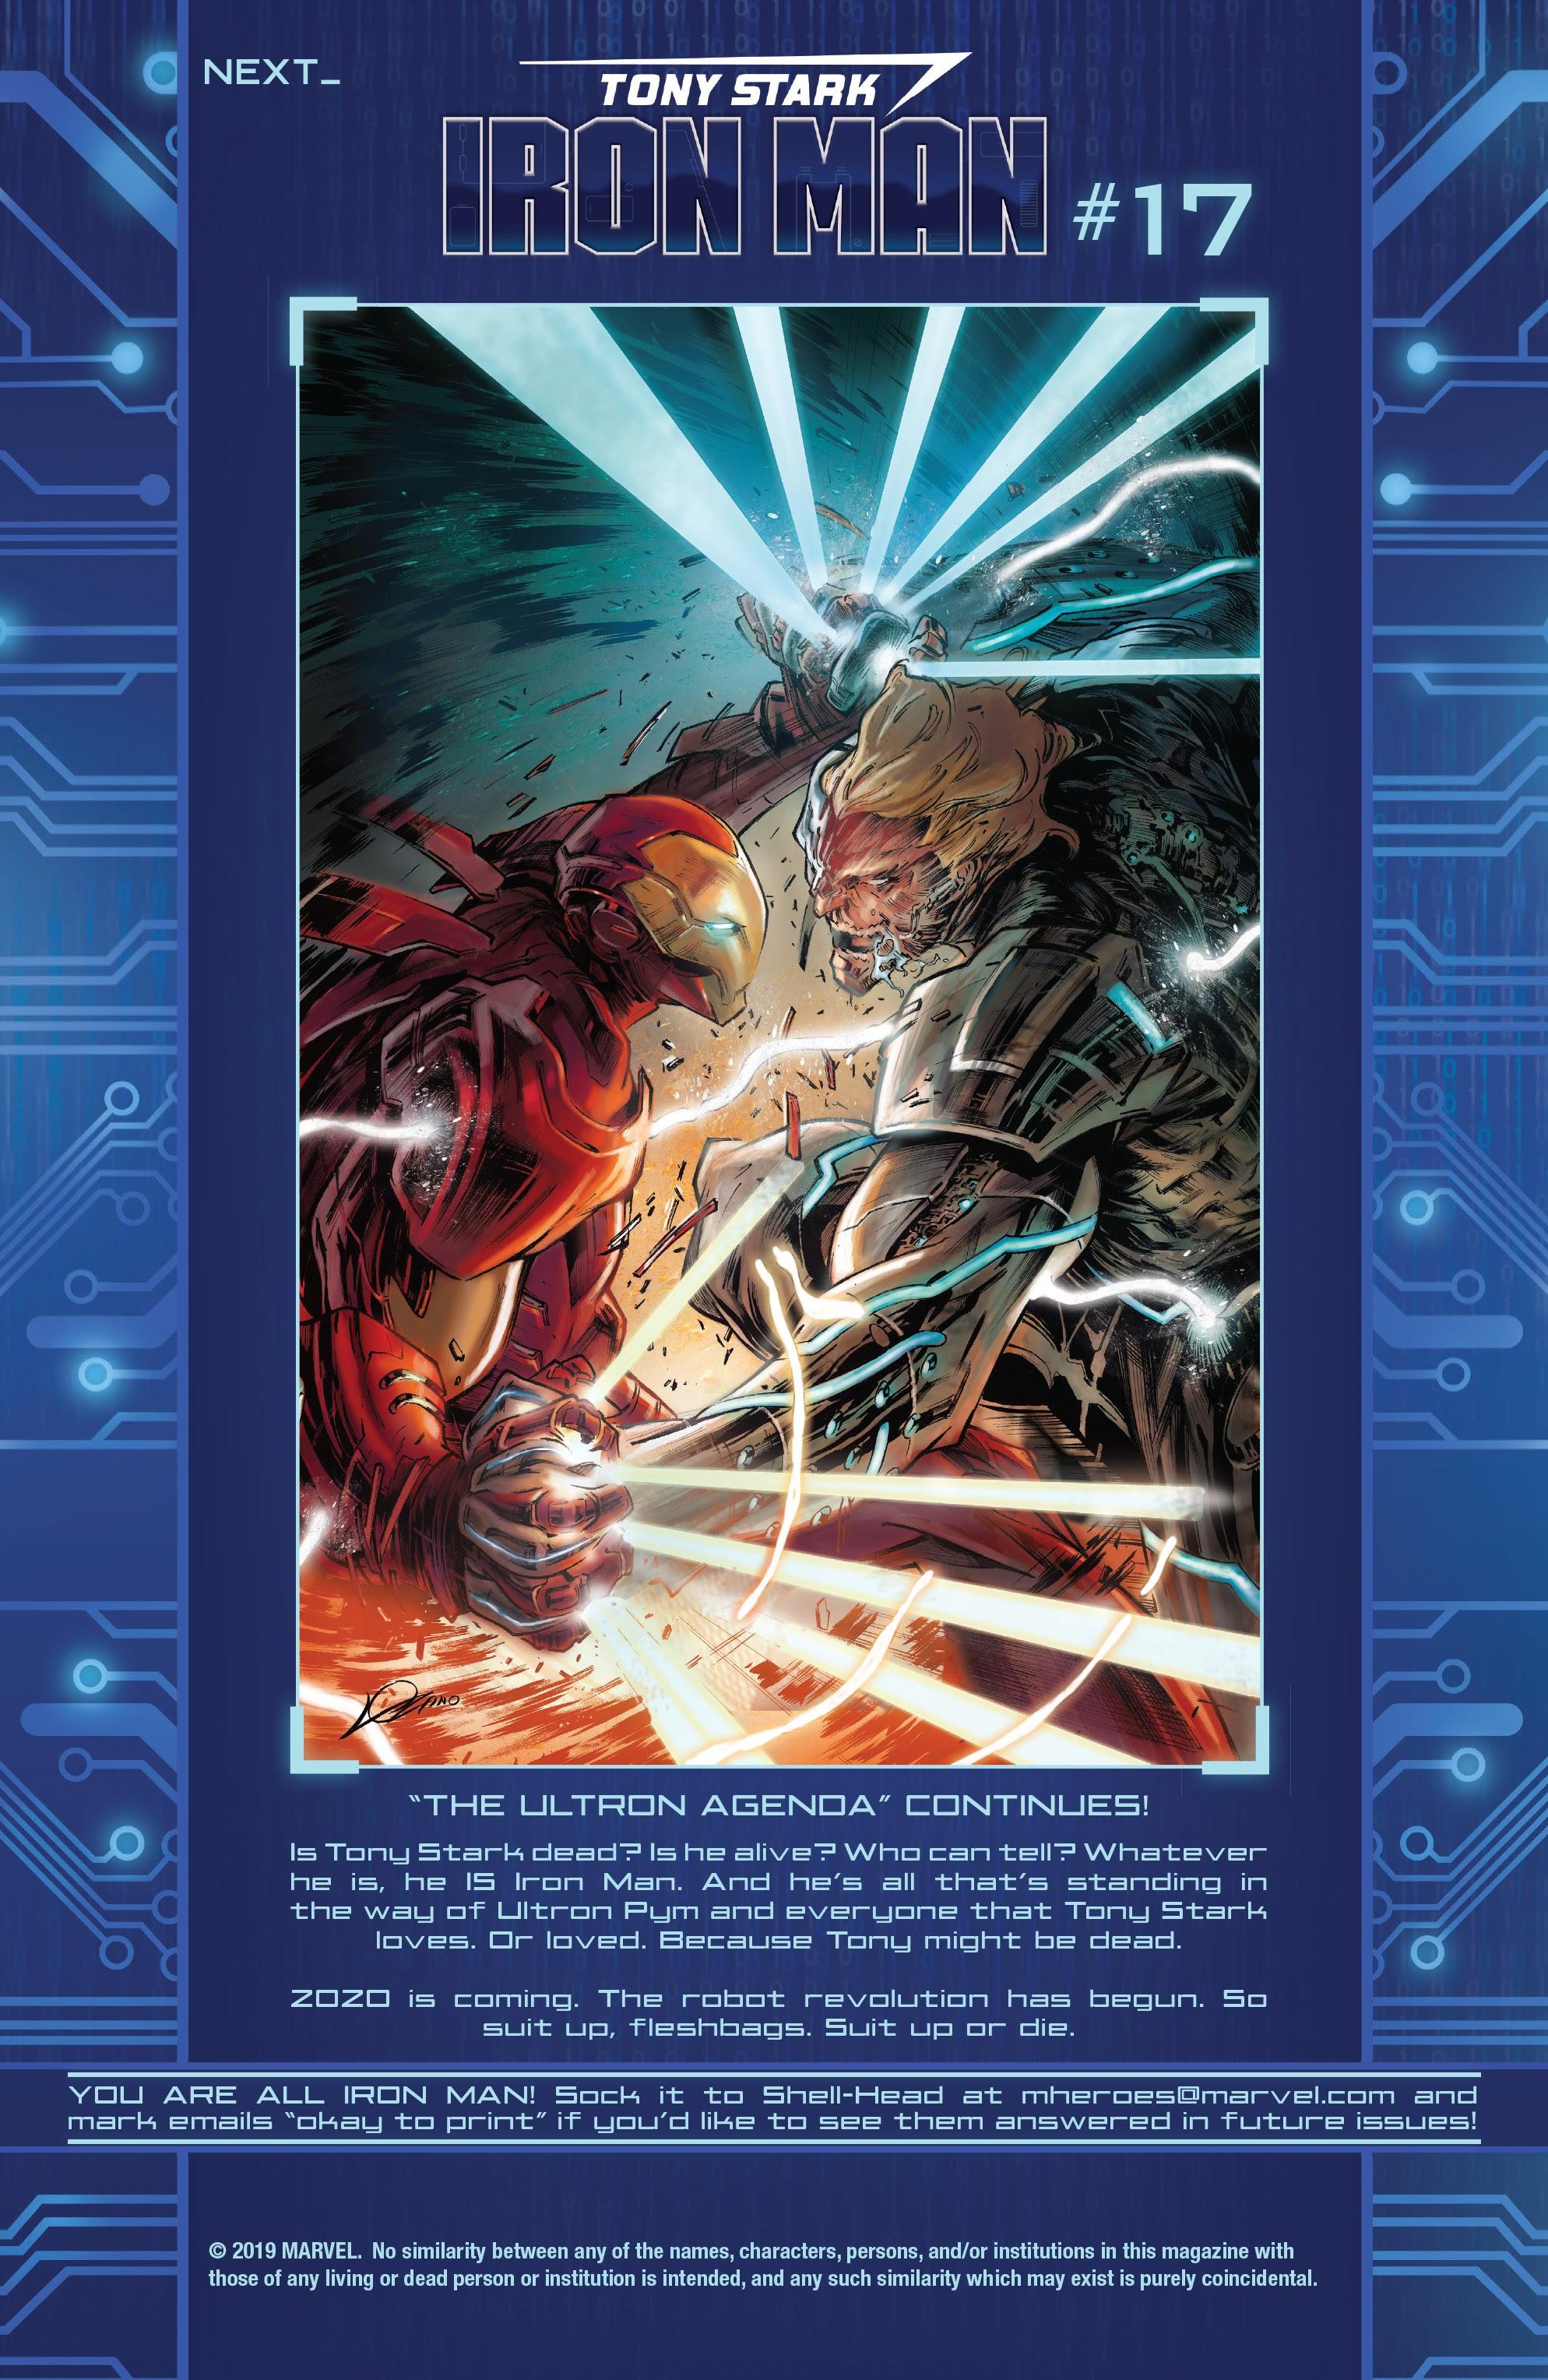 Read online Tony Stark: Iron Man comic -  Issue #16 - 23